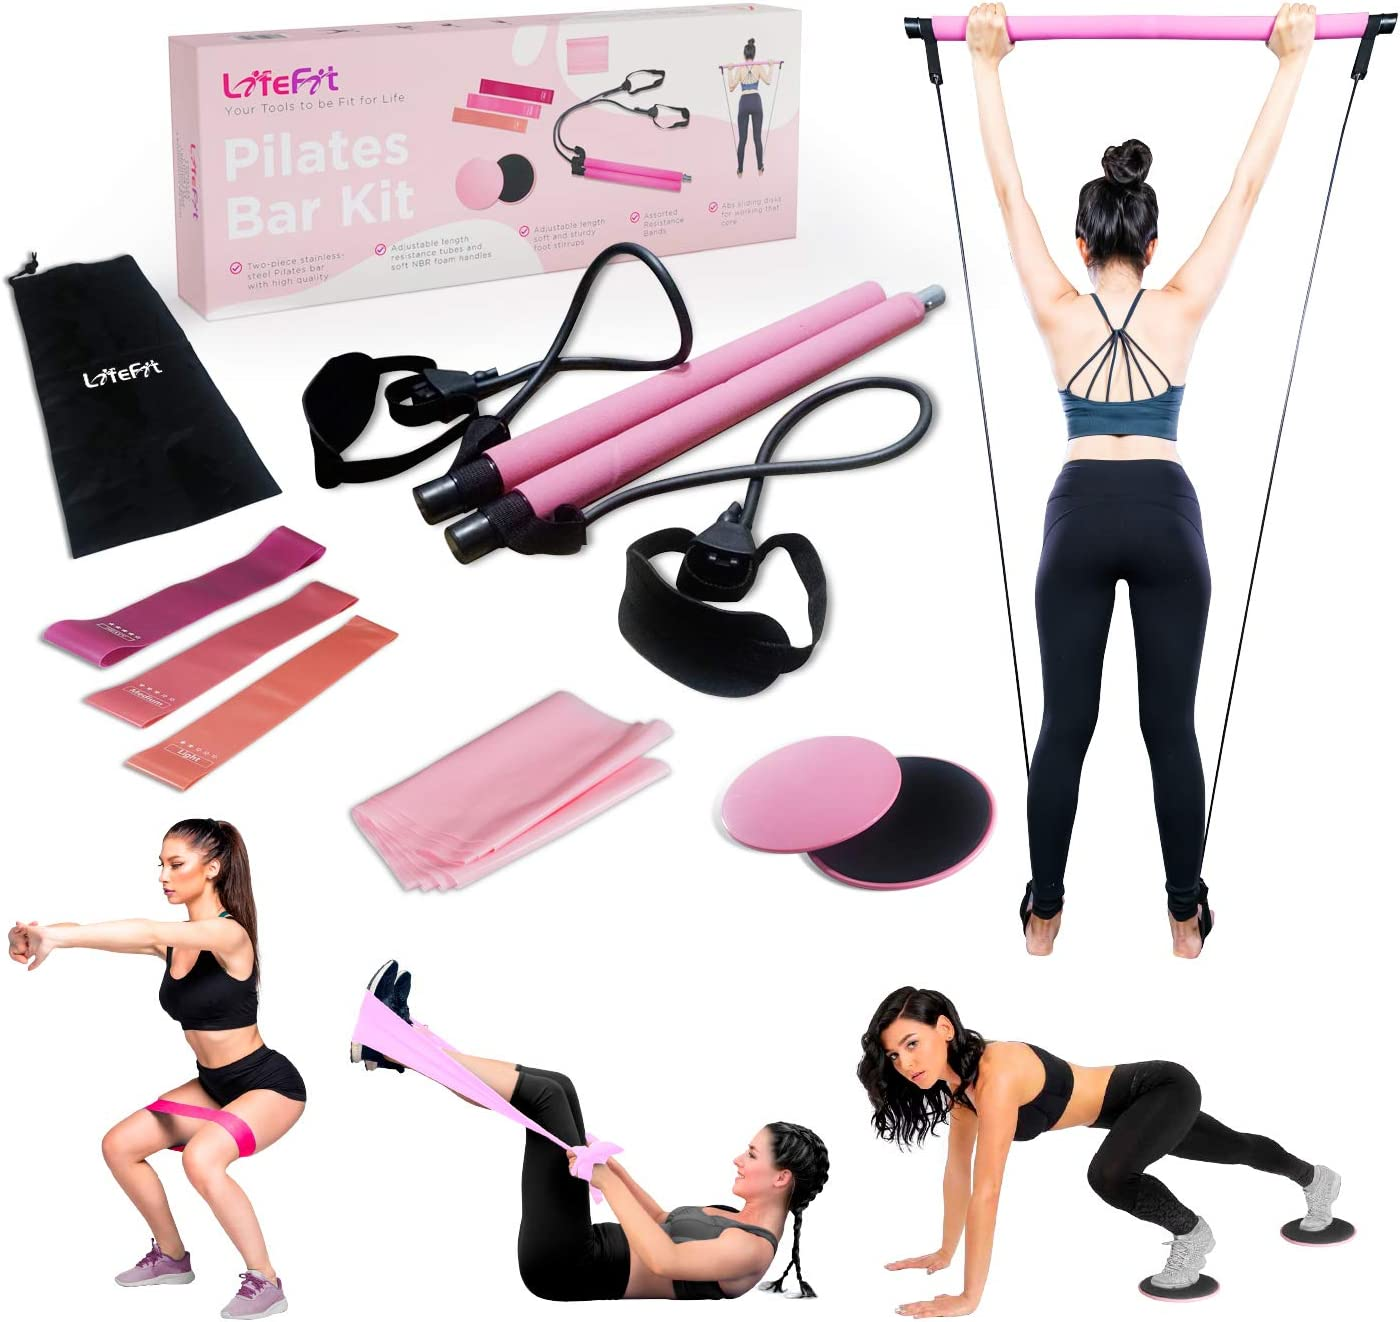 Portable Pilates Bar Kit Exercise Stick Butt Resistance Band Toning Gym Tube